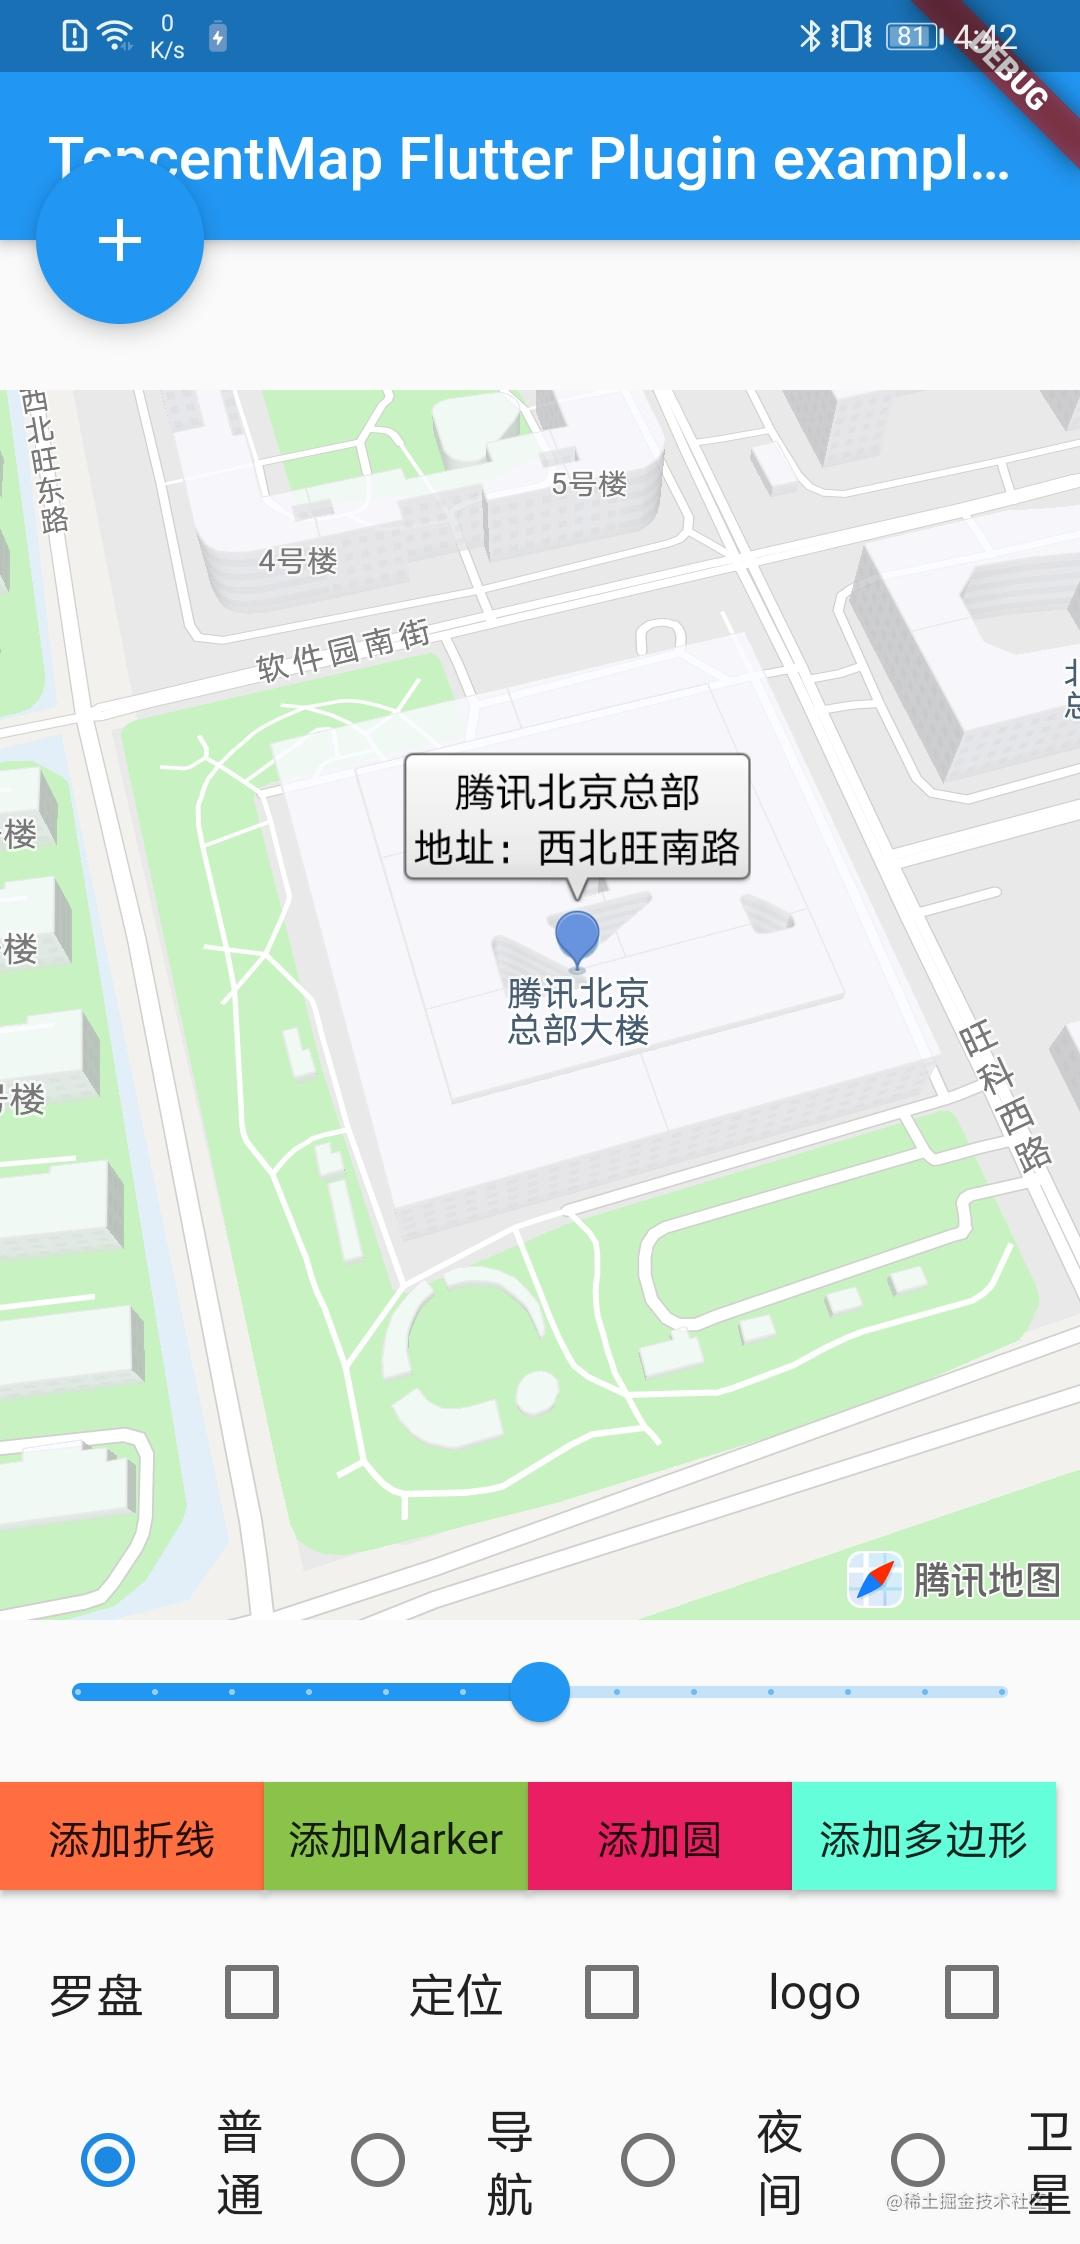 Screenshot_20210324_164210_com.tencent.tencentmap_example.jpg